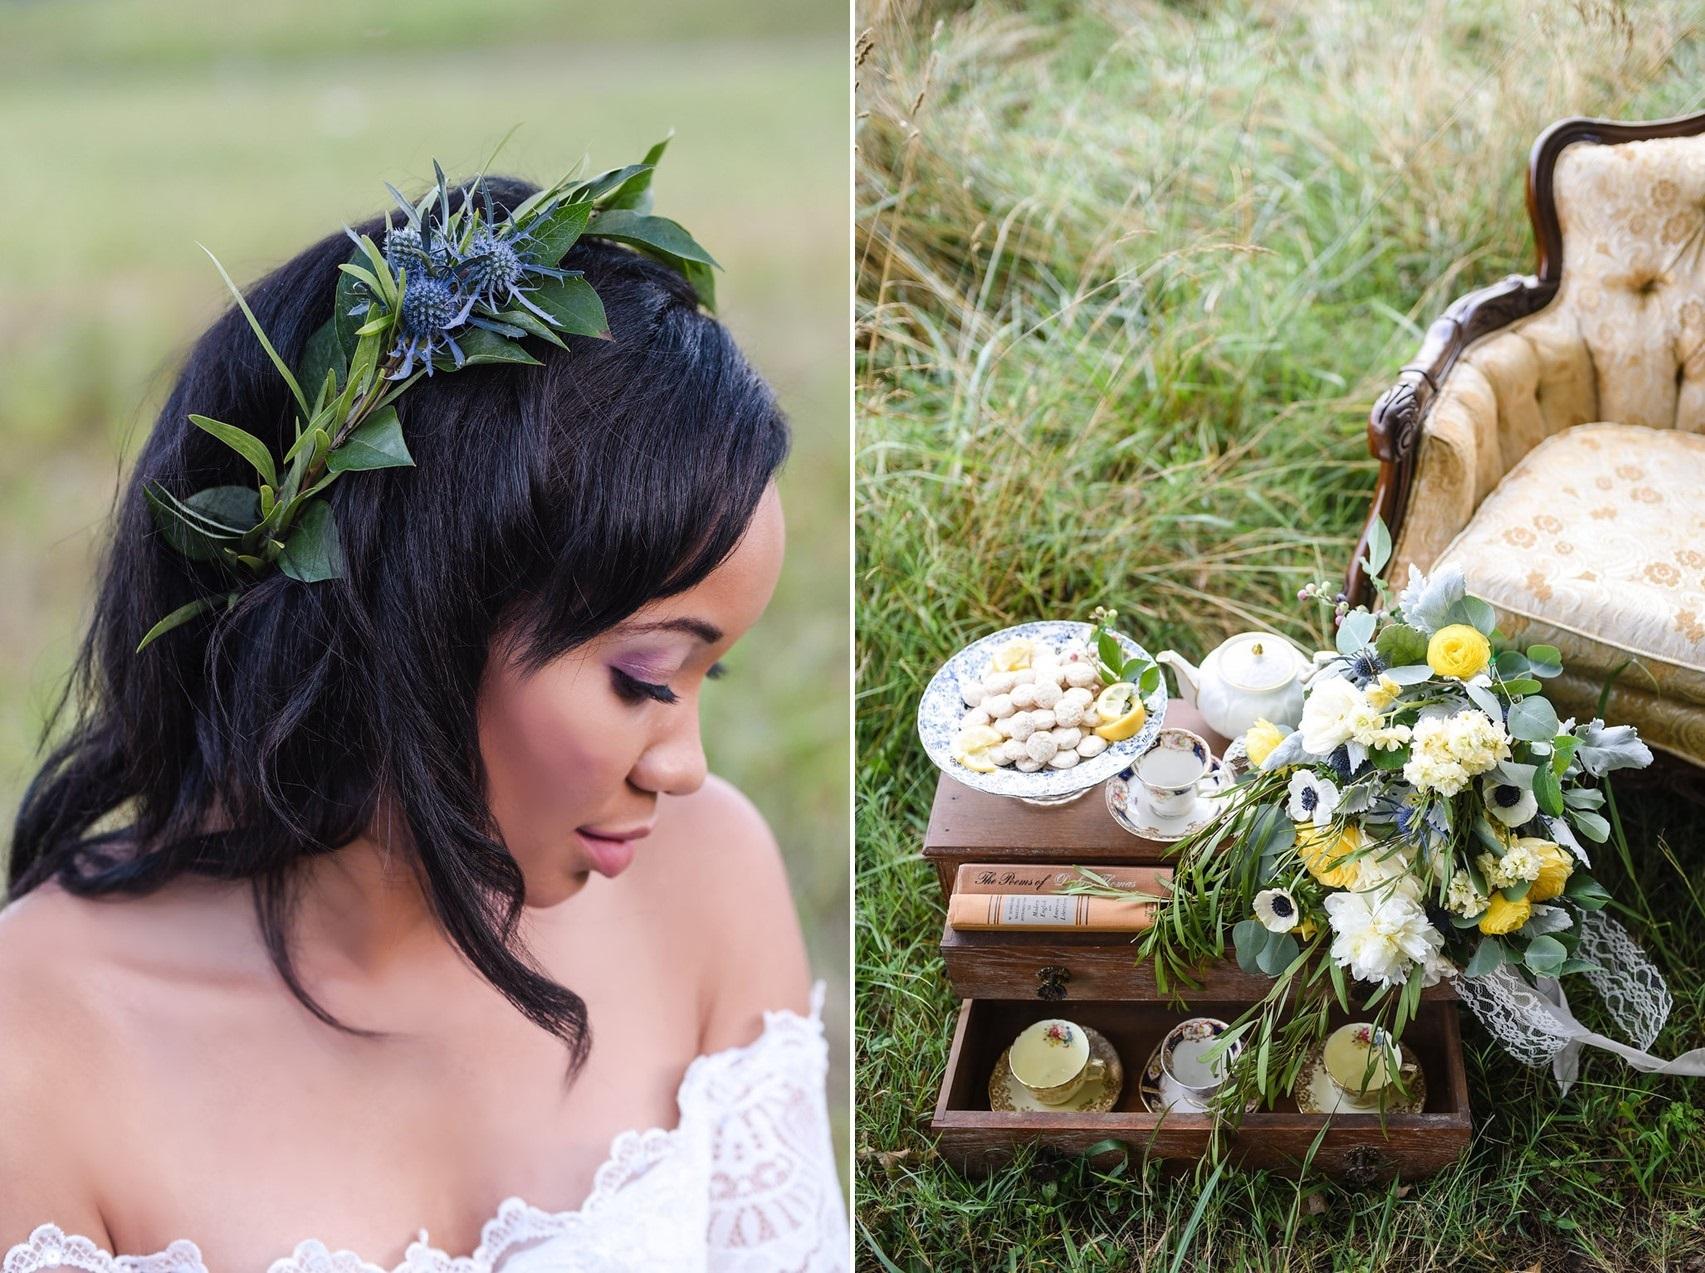 Vintage Inspired Bride in a Floral Crown